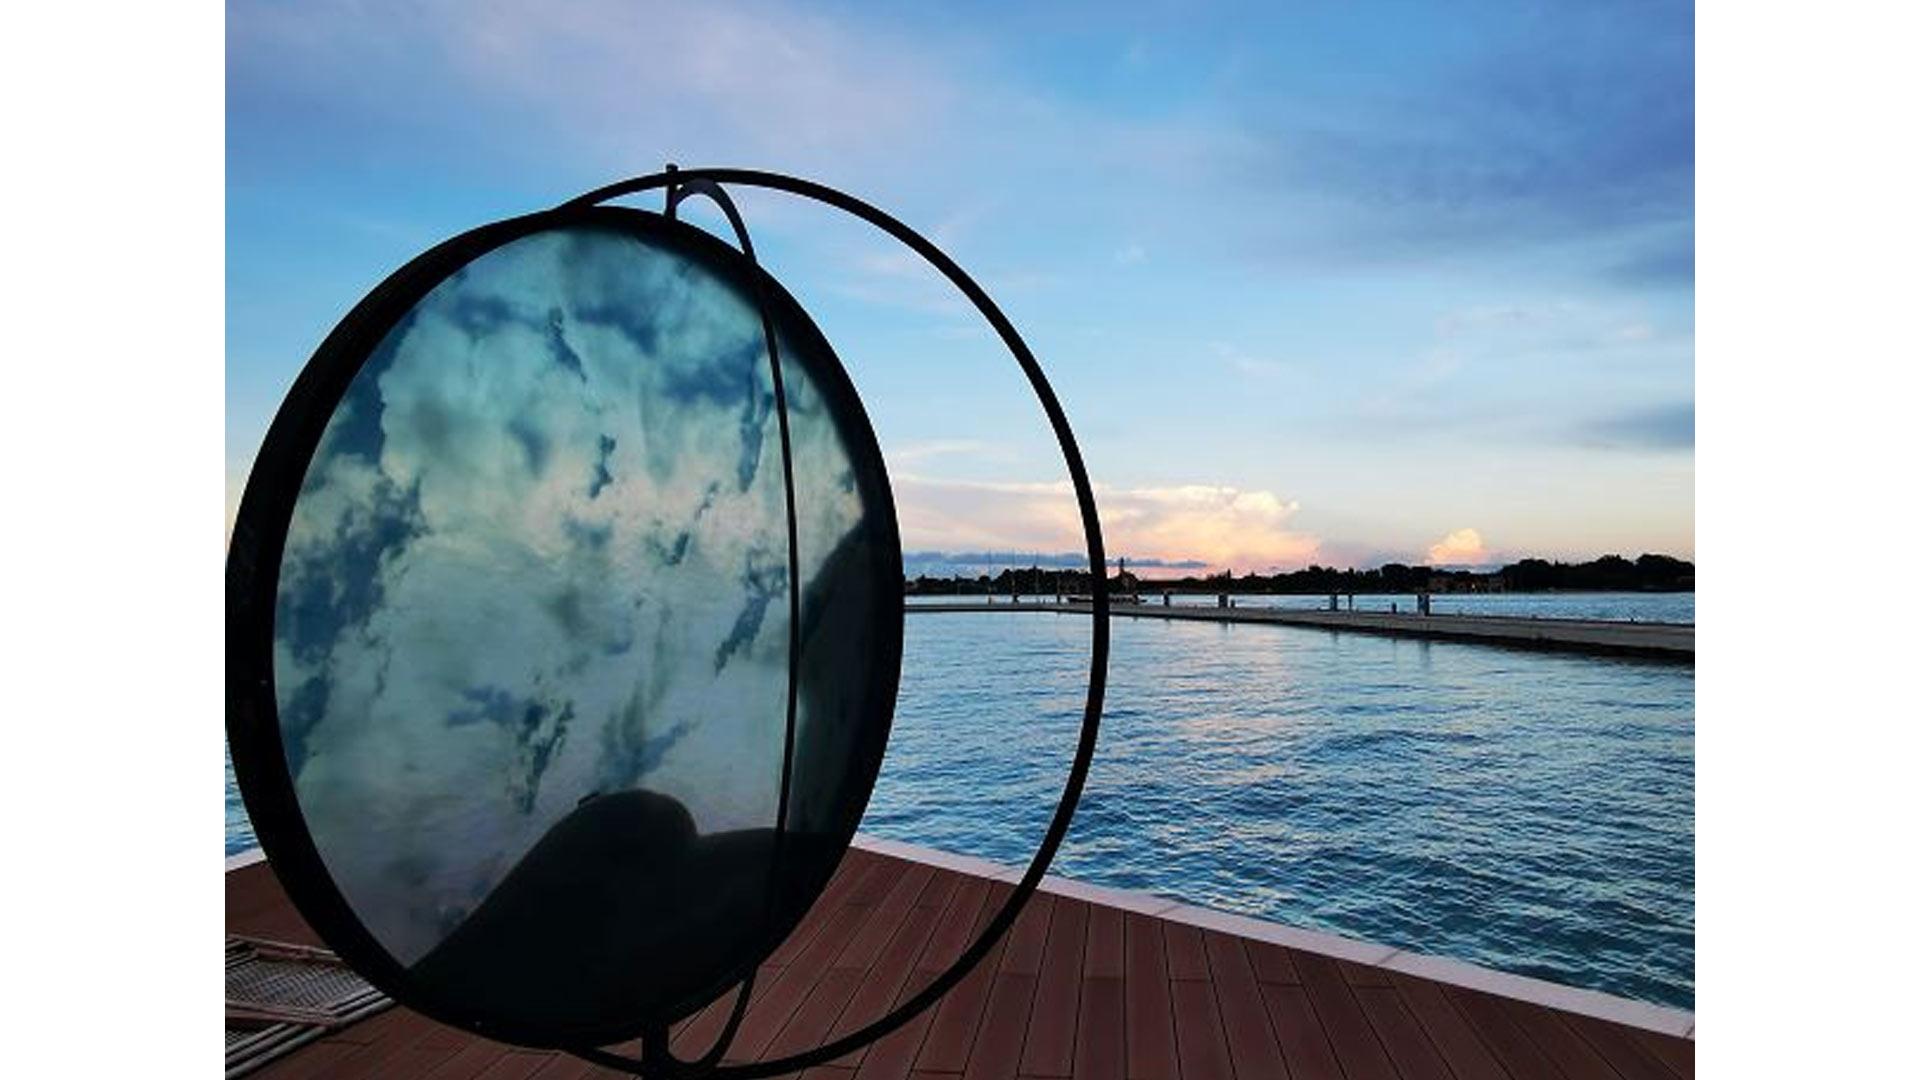 Biennale Internazionale Arte Sacra Contemporanea 2020 a Venezia